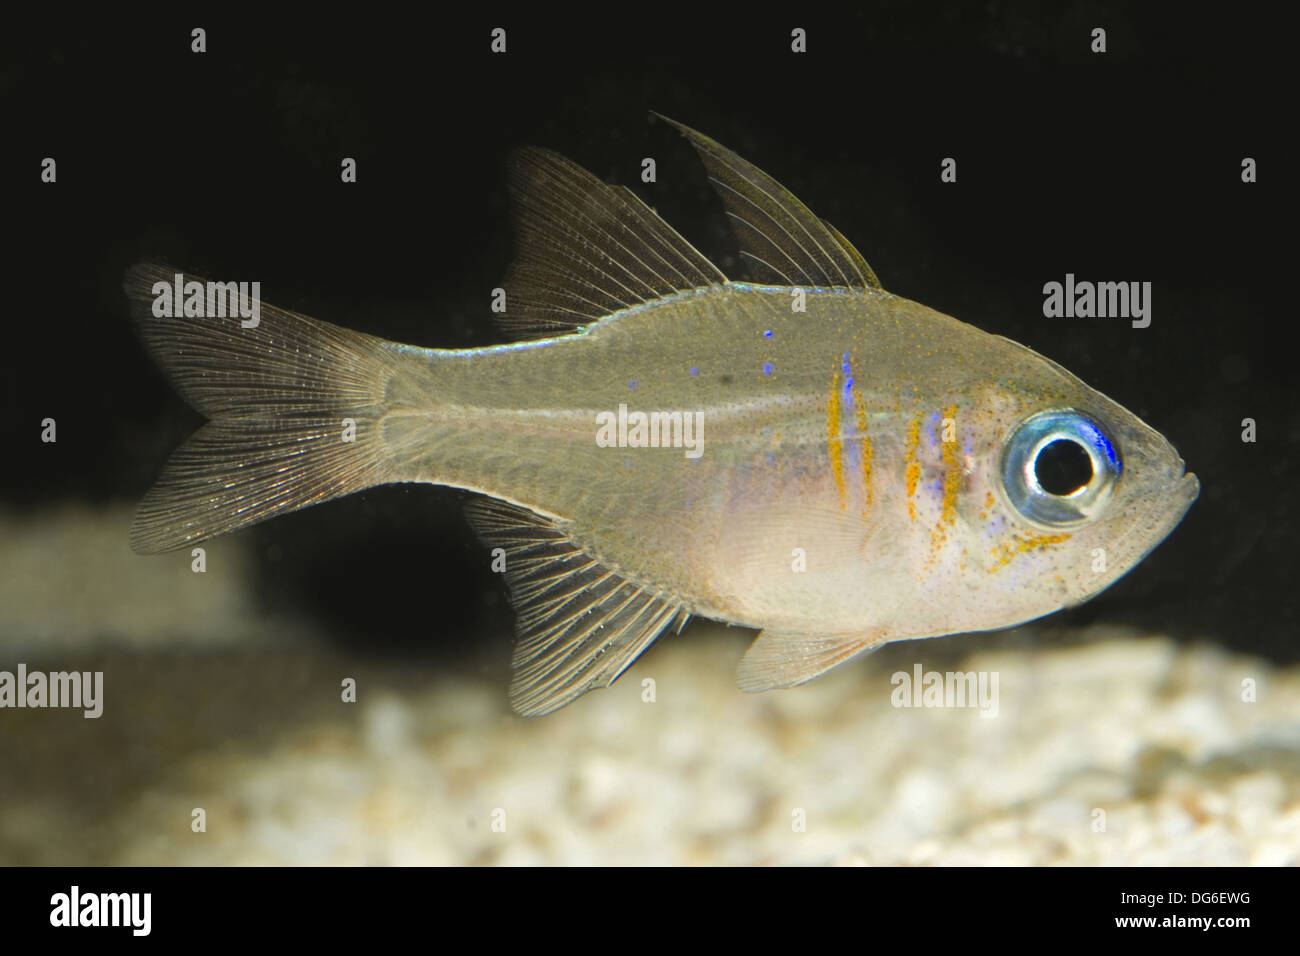 threadfin cardinalfish, apogon leptacanthus - Stock Image